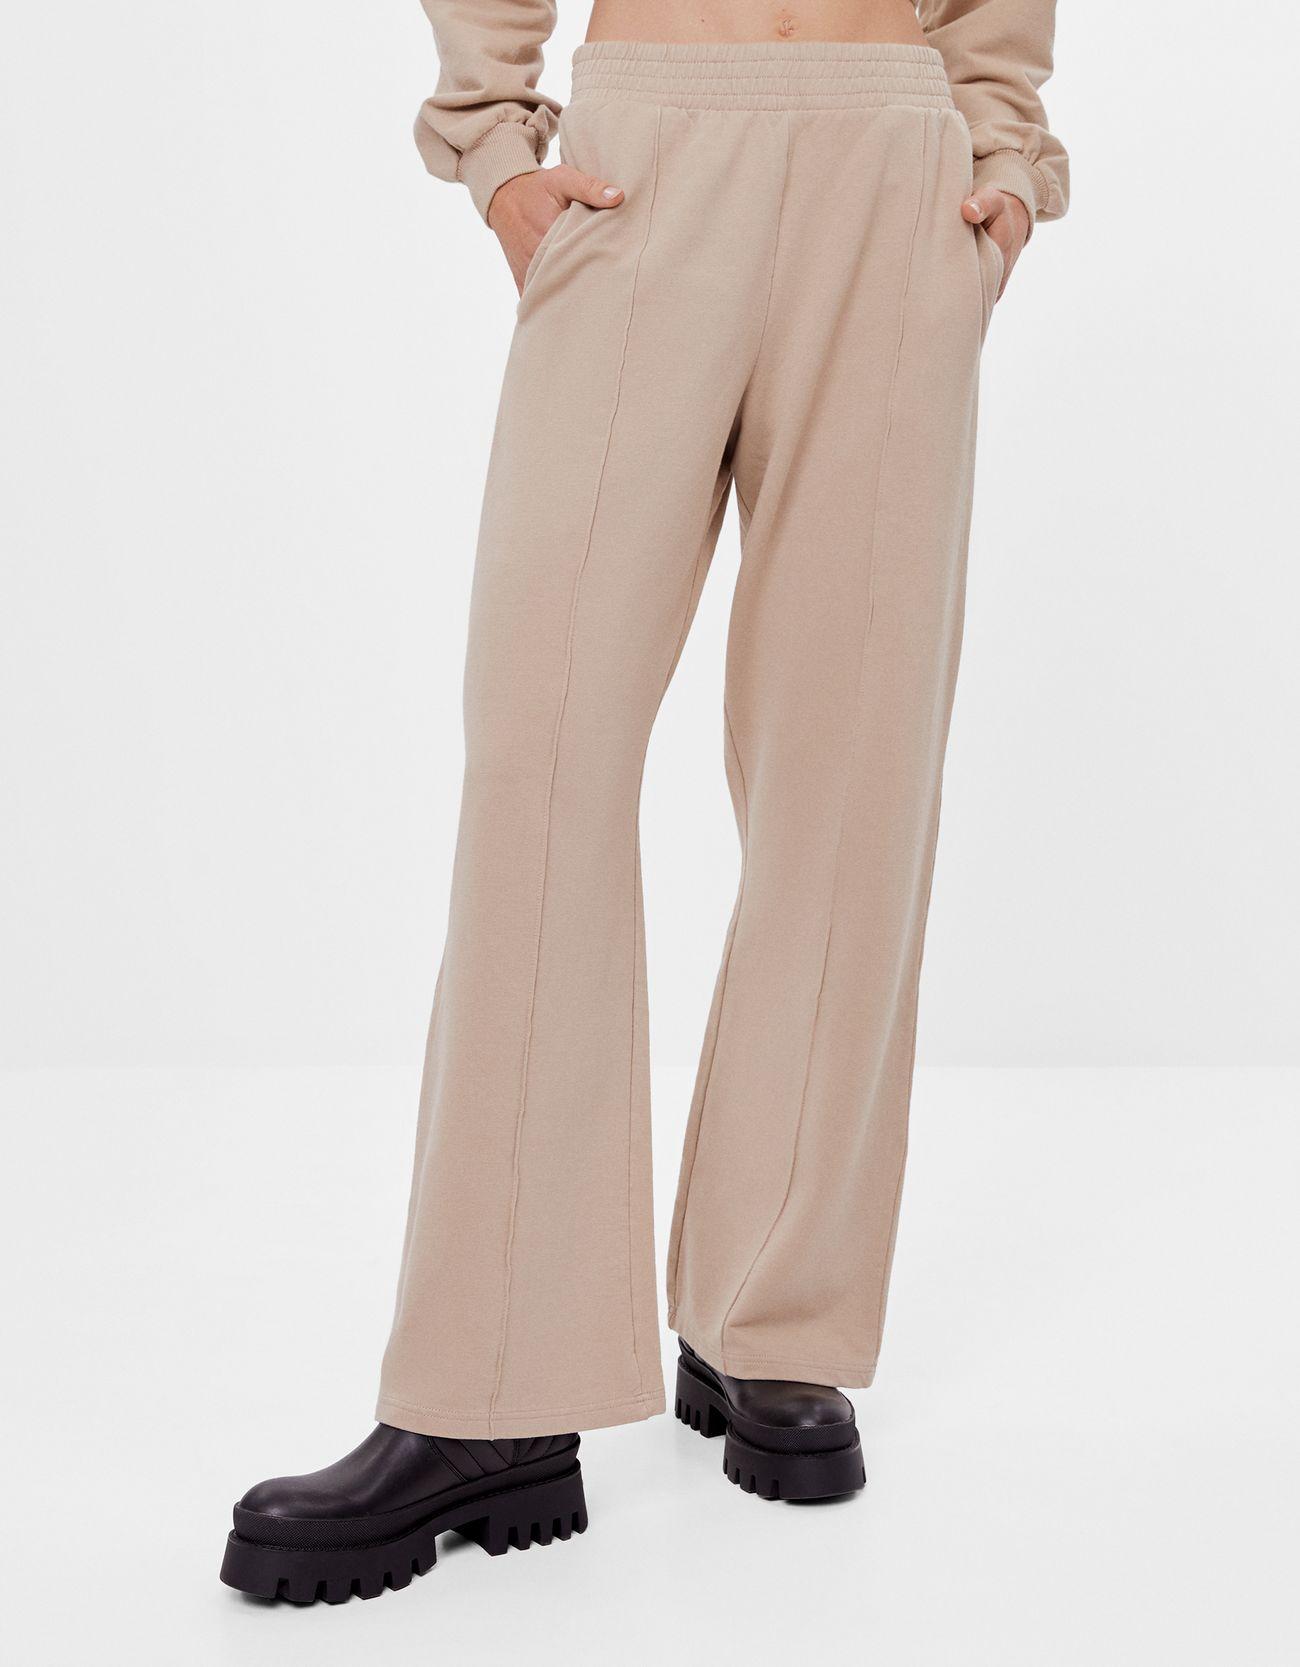 Pantalón de felpa con diseño wid leg